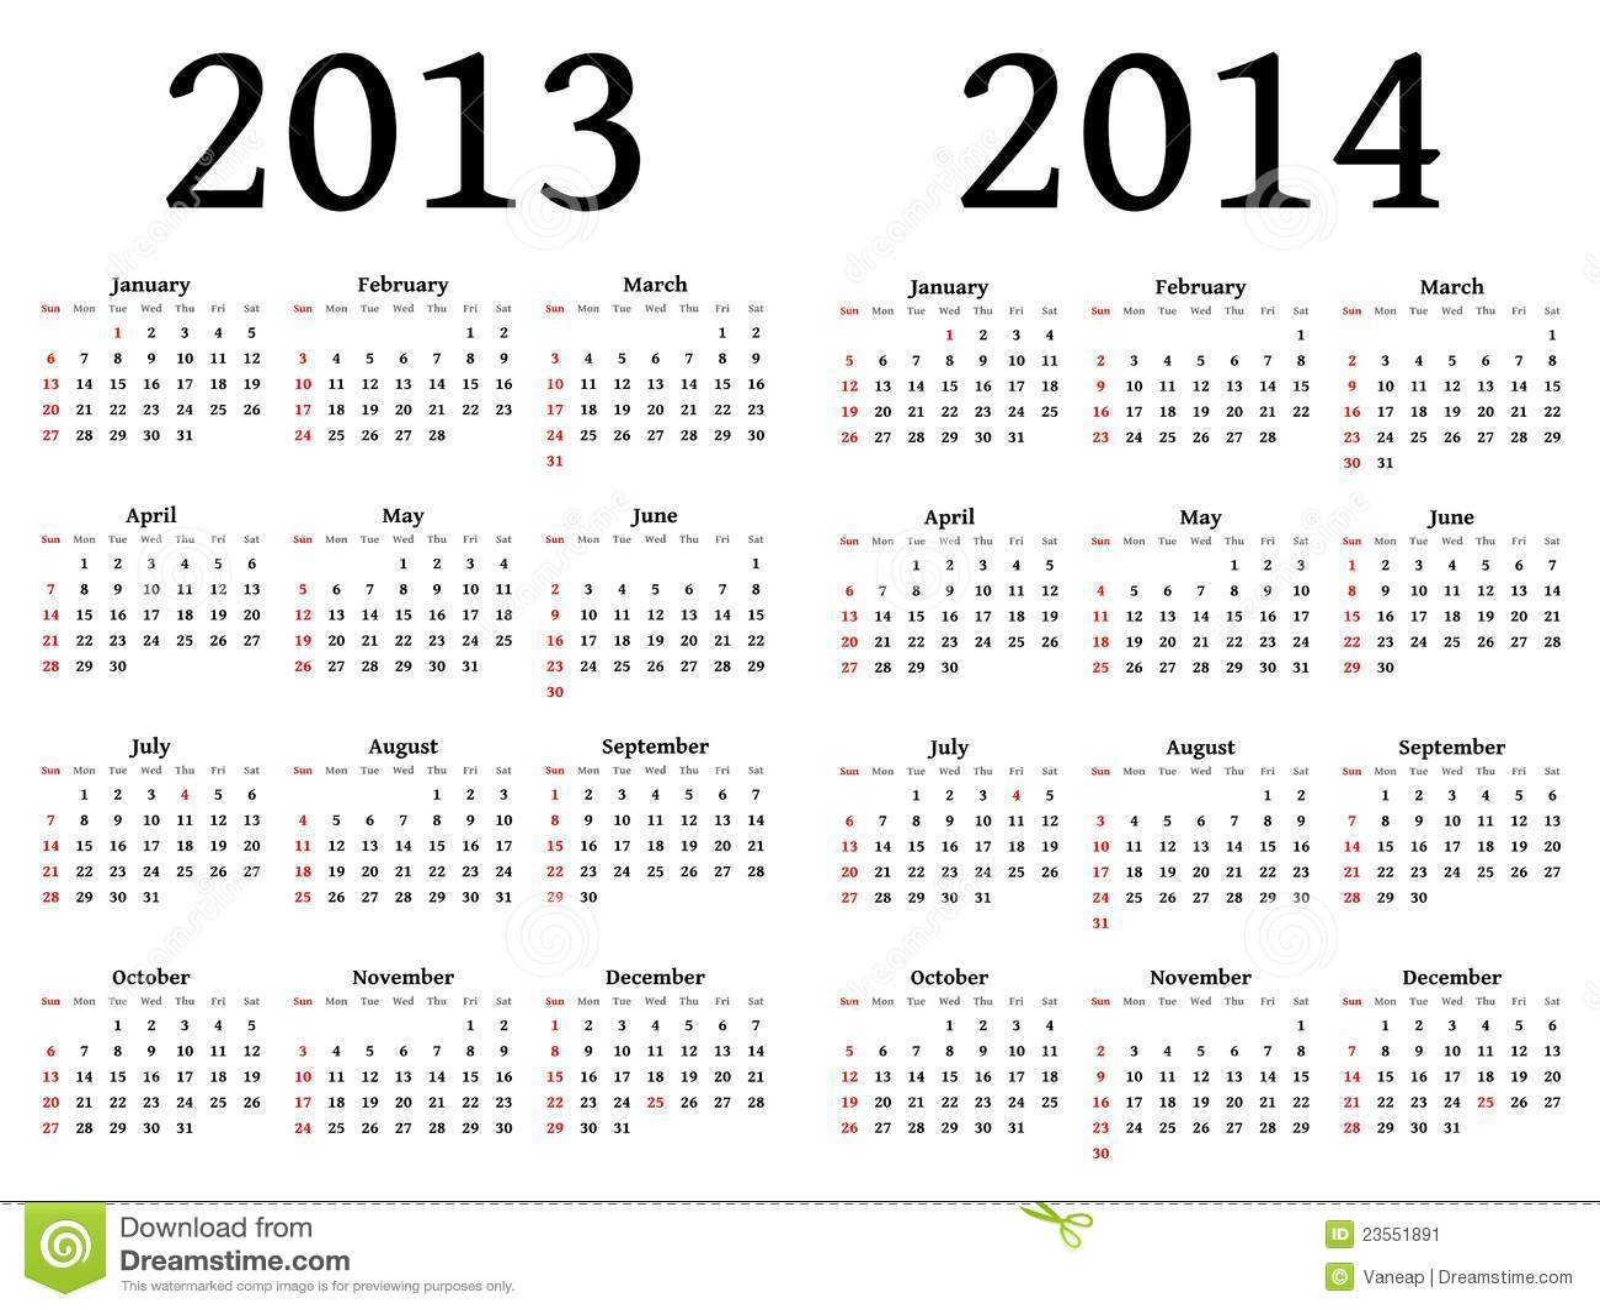 2013 2014 Calendar